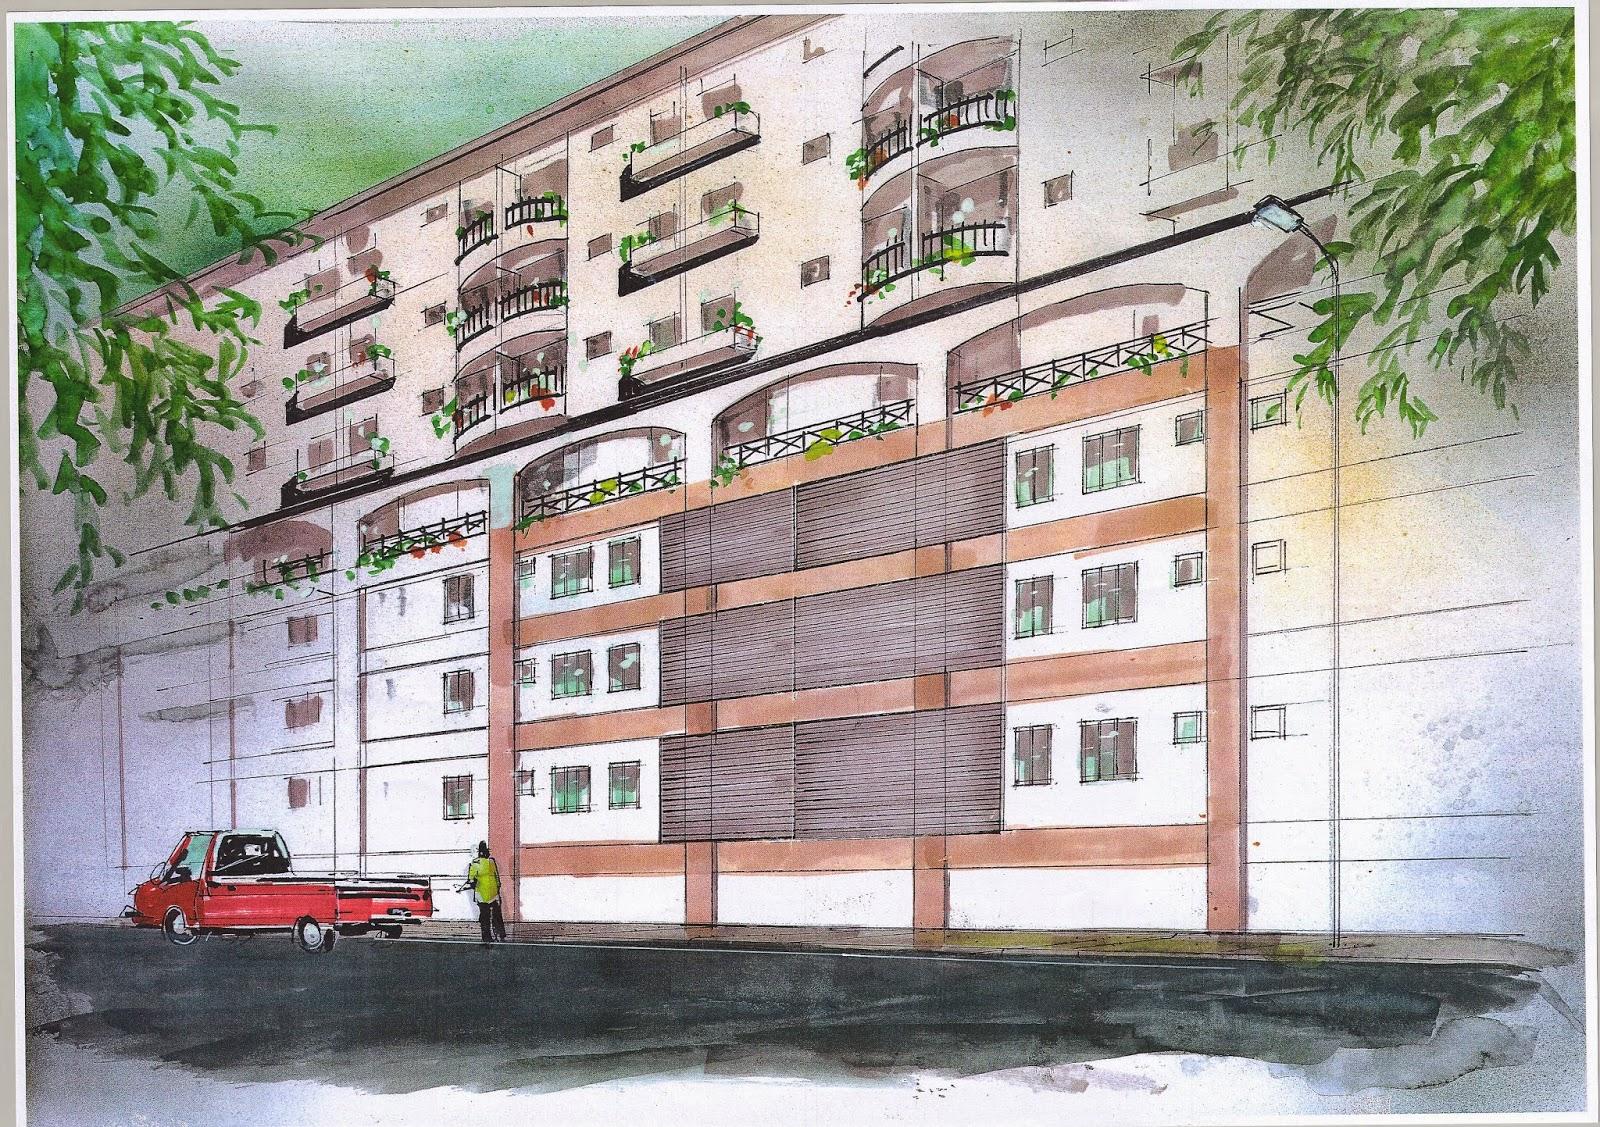 as architechnic hotel wisma indah cheras kuala lumpur